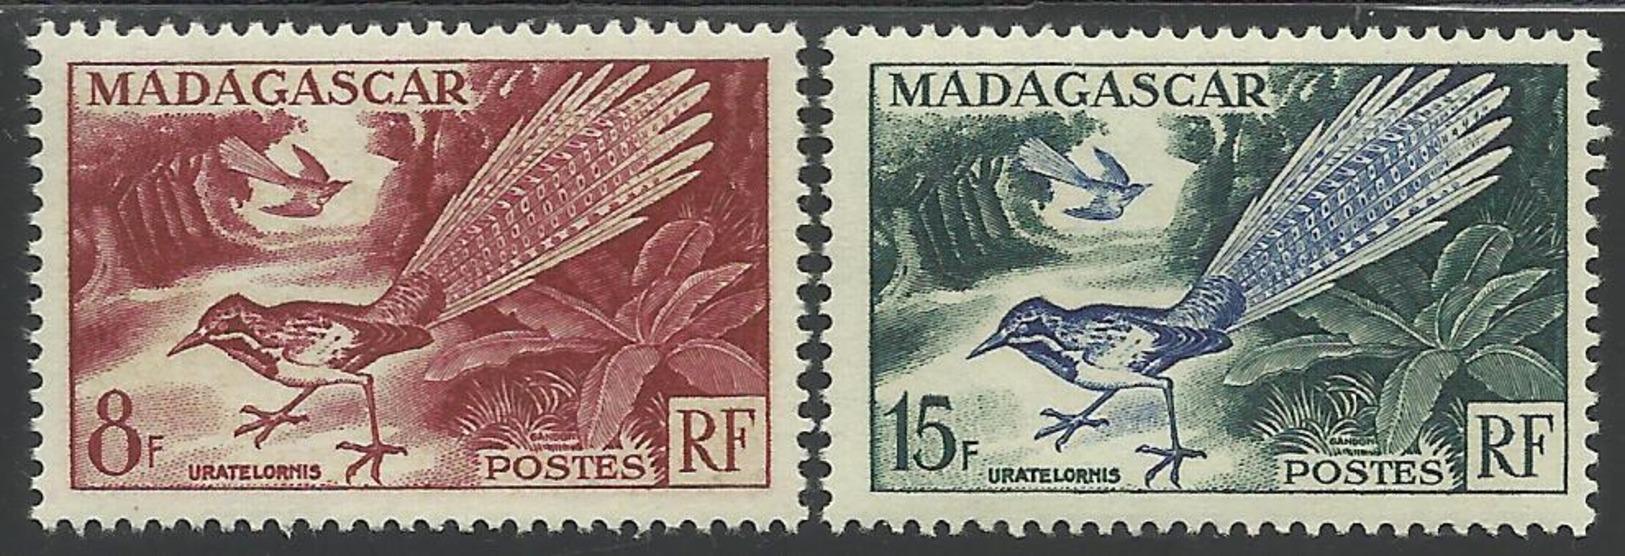 MADAGASCAR 1954 YT 323/324** - Neufs